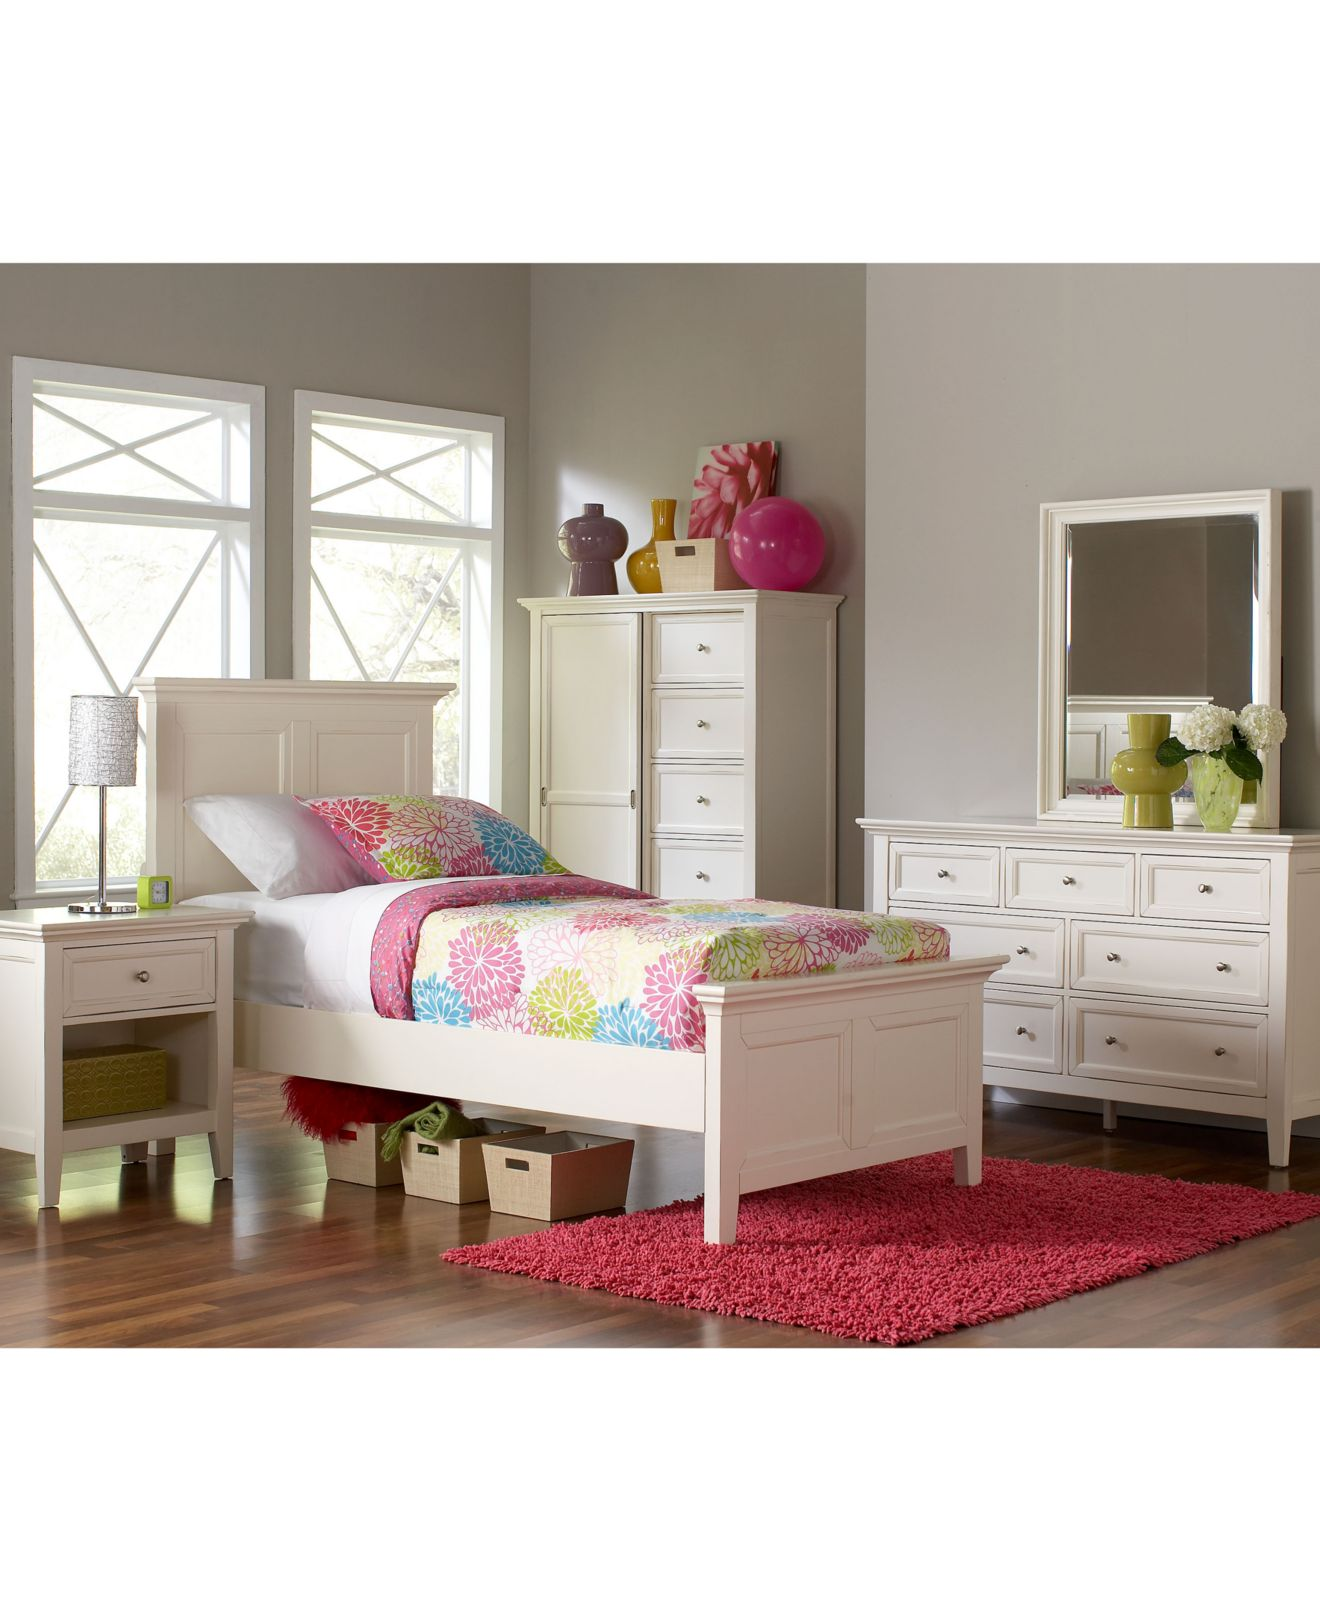 sanibel furniture Shop for and Buy sanibel furniture line Macy s